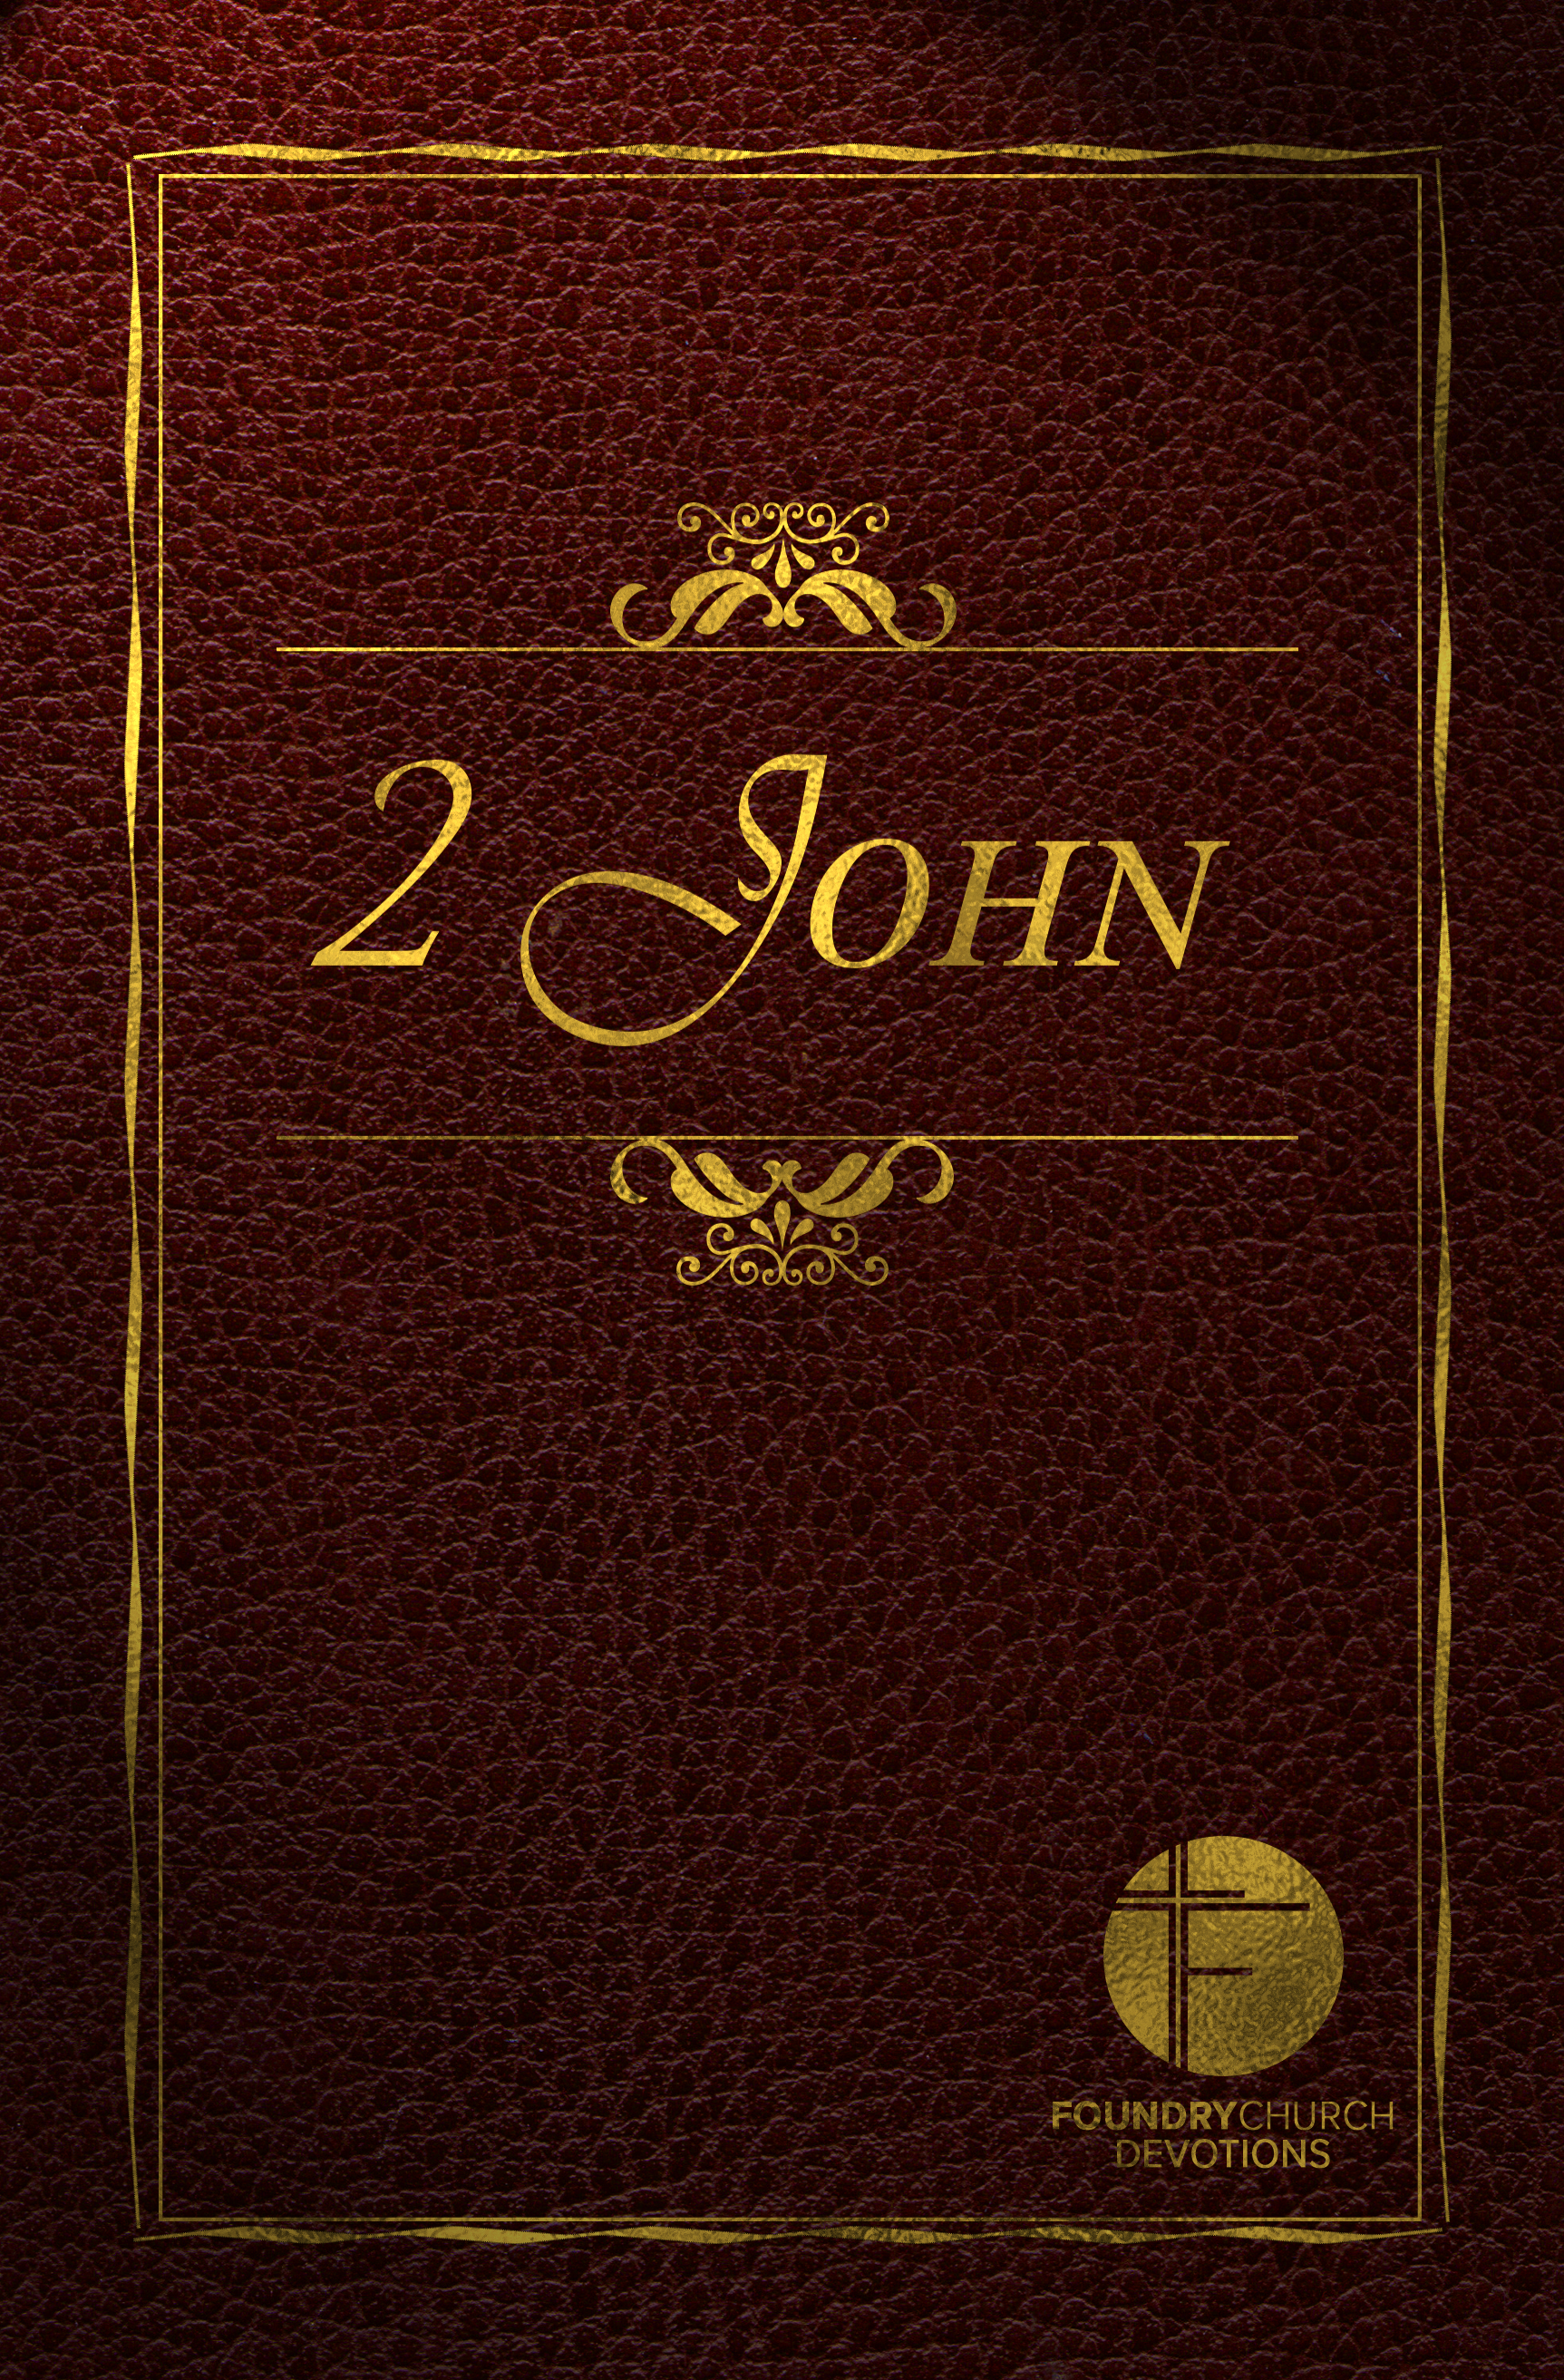 2 John cover web.png